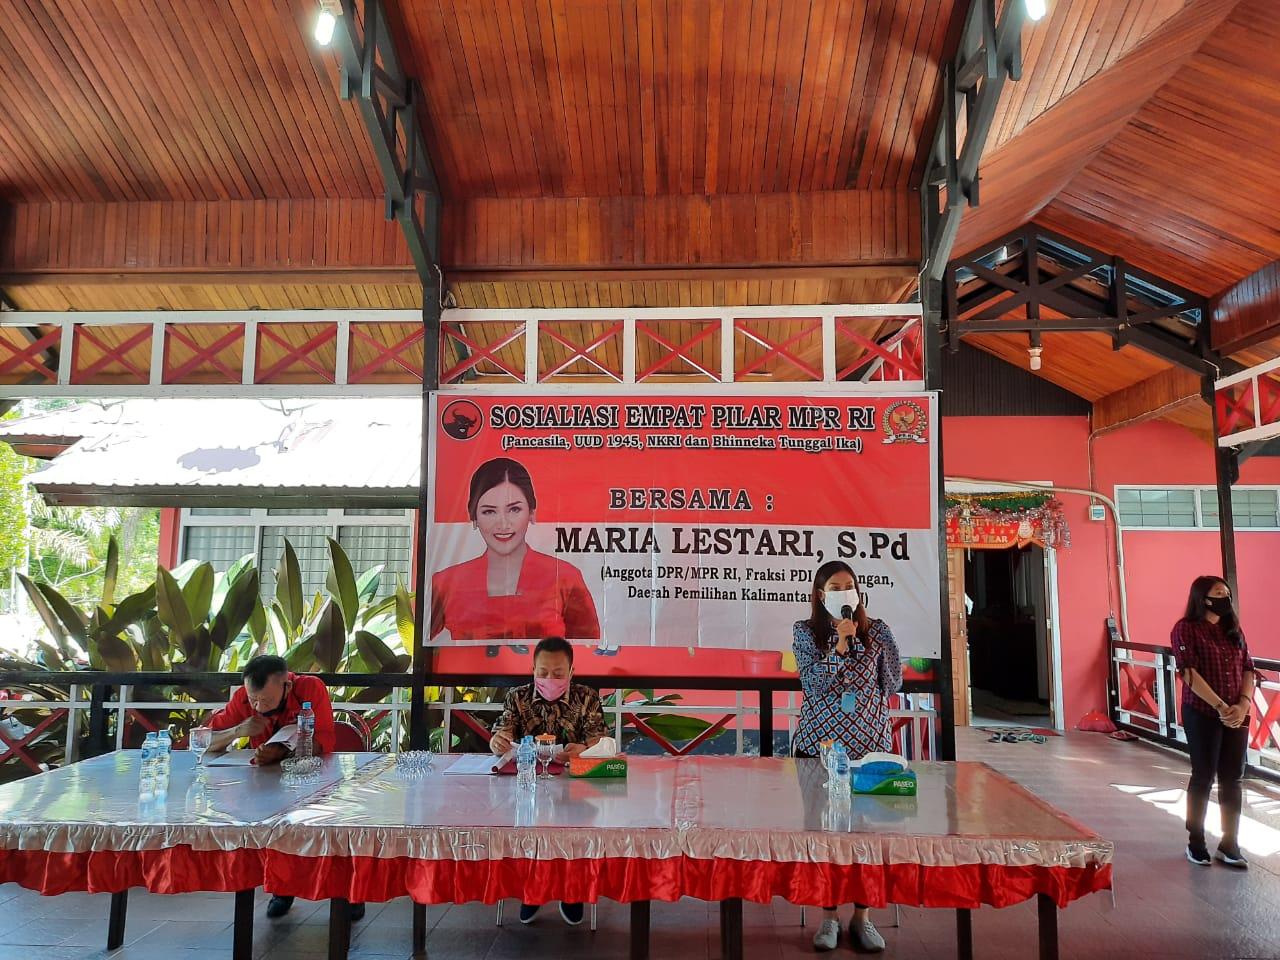 Anggota DPR/MPR RI, Maria Lestari, S.Pd Sosialisasikan 4 Pilar MPR RI Kepada Wanita Muslimah dan Kelompok Pengajian di Kota Ngabang, Kab. Landak.